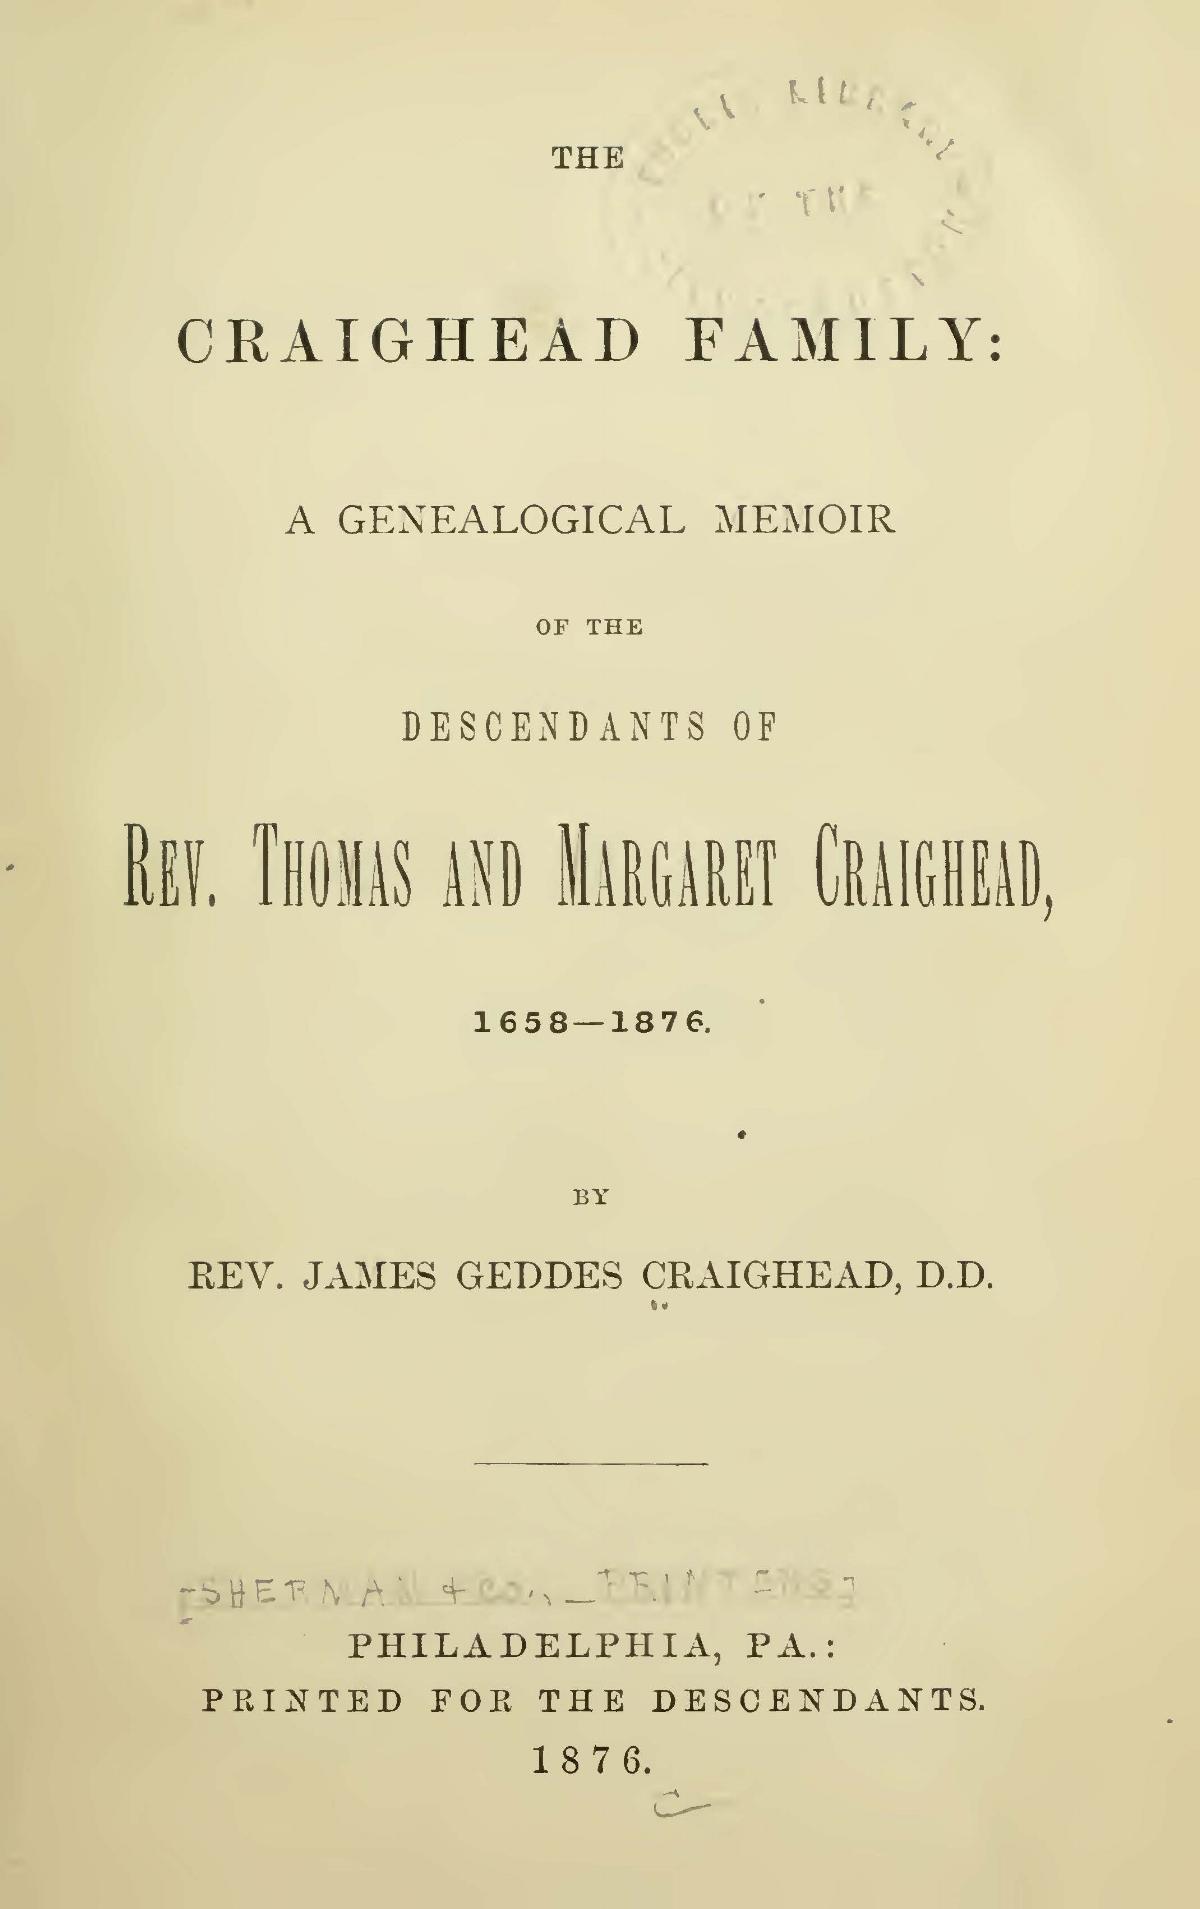 Craighead, James Geddes, The Craighead Family A Genealogical Memoir Title Page.jpg